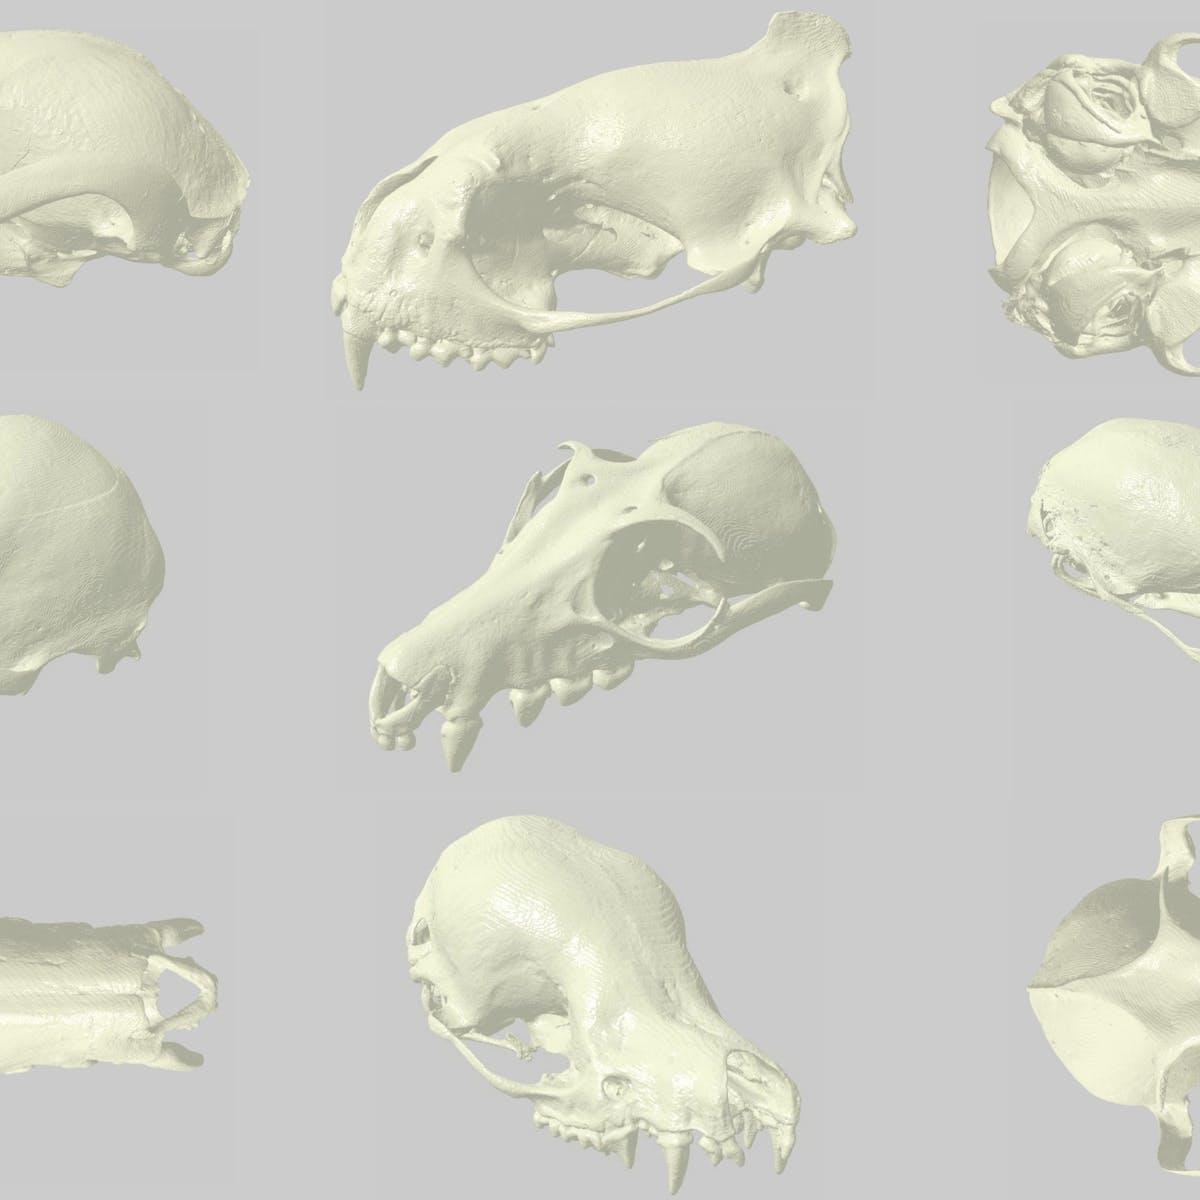 3D scans of bat skulls help natural history museums open up